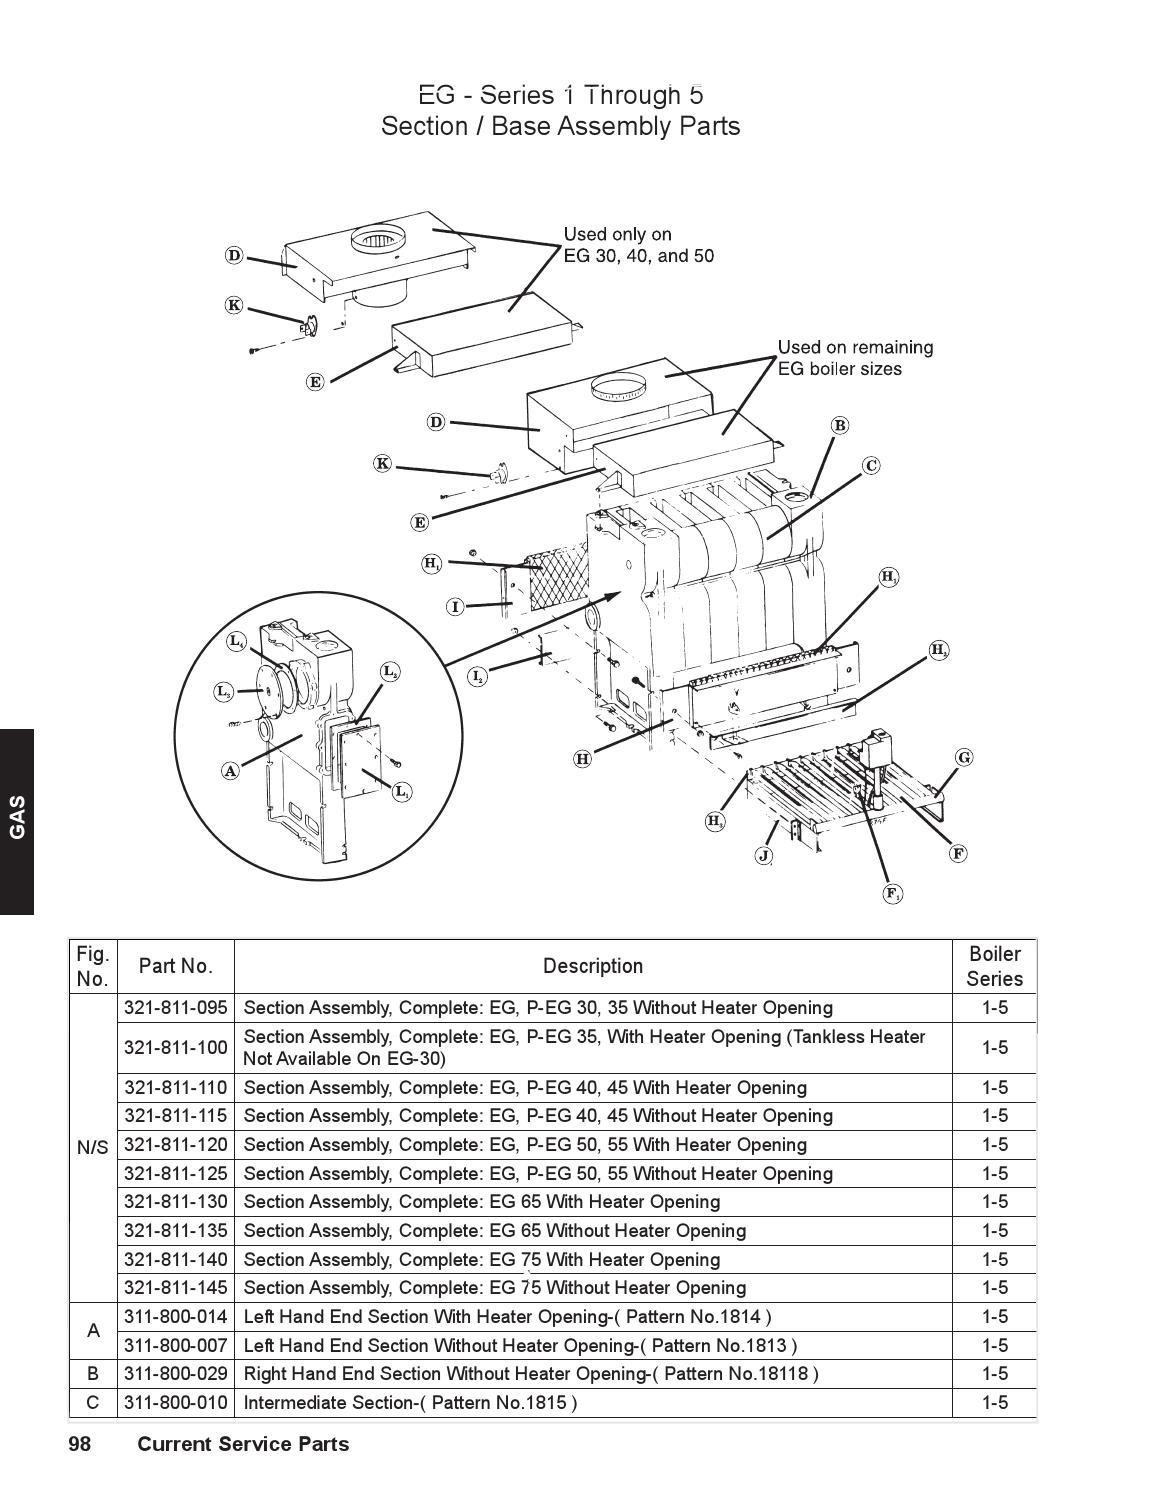 Großartig Gaskessel Weil Mclain Bilder - Schaltplan Serie Circuit ...